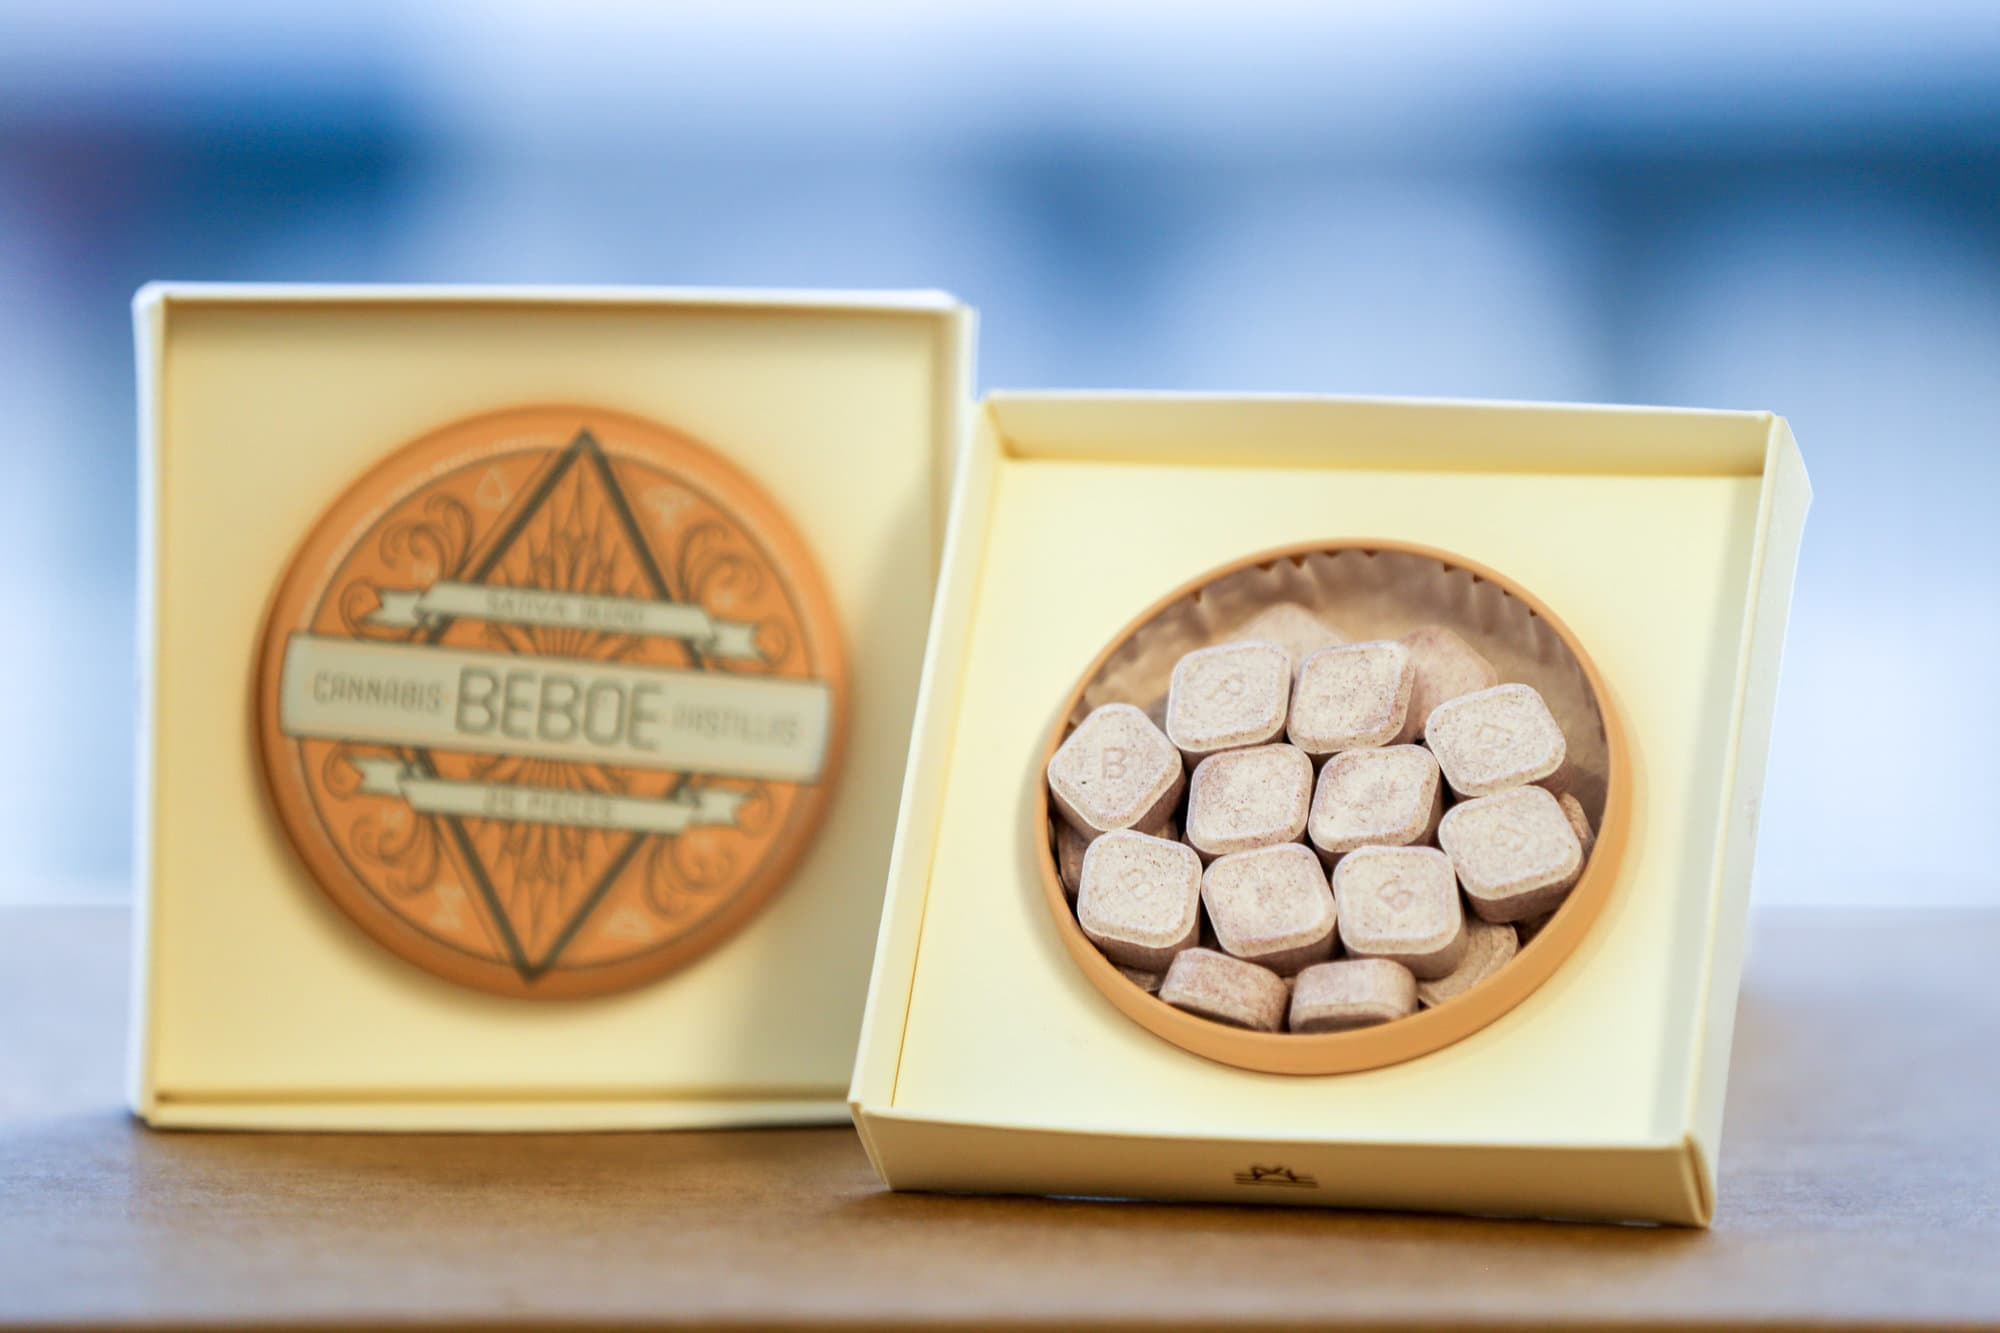 Beboe Luxury Cannabis Products : Edible Pastilles